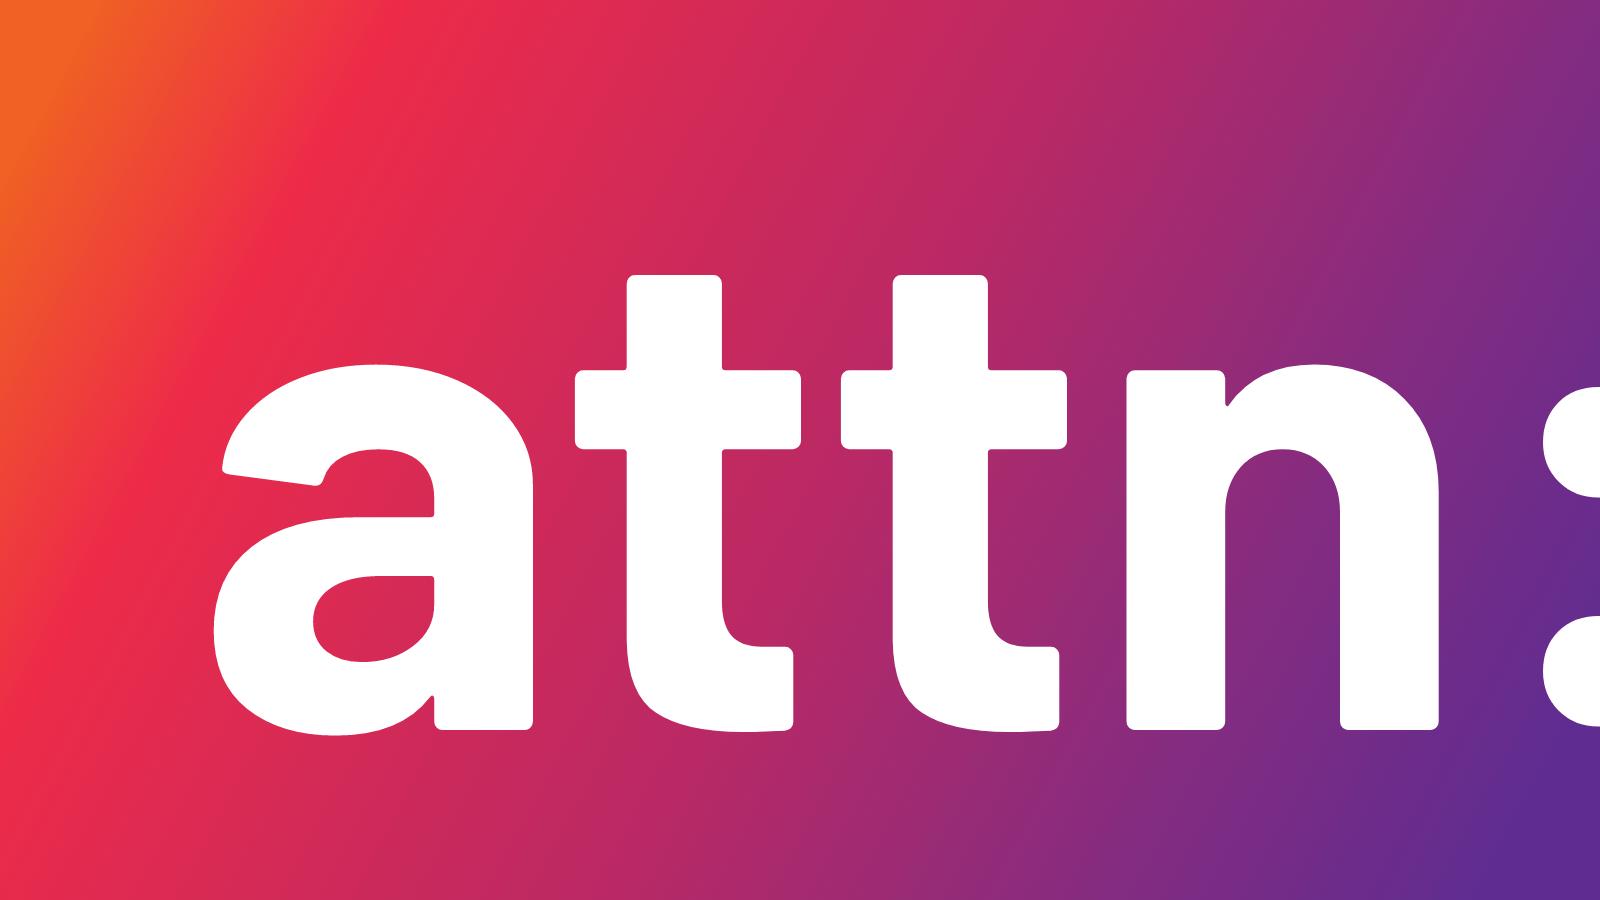 attn: shorthand and abbreviations